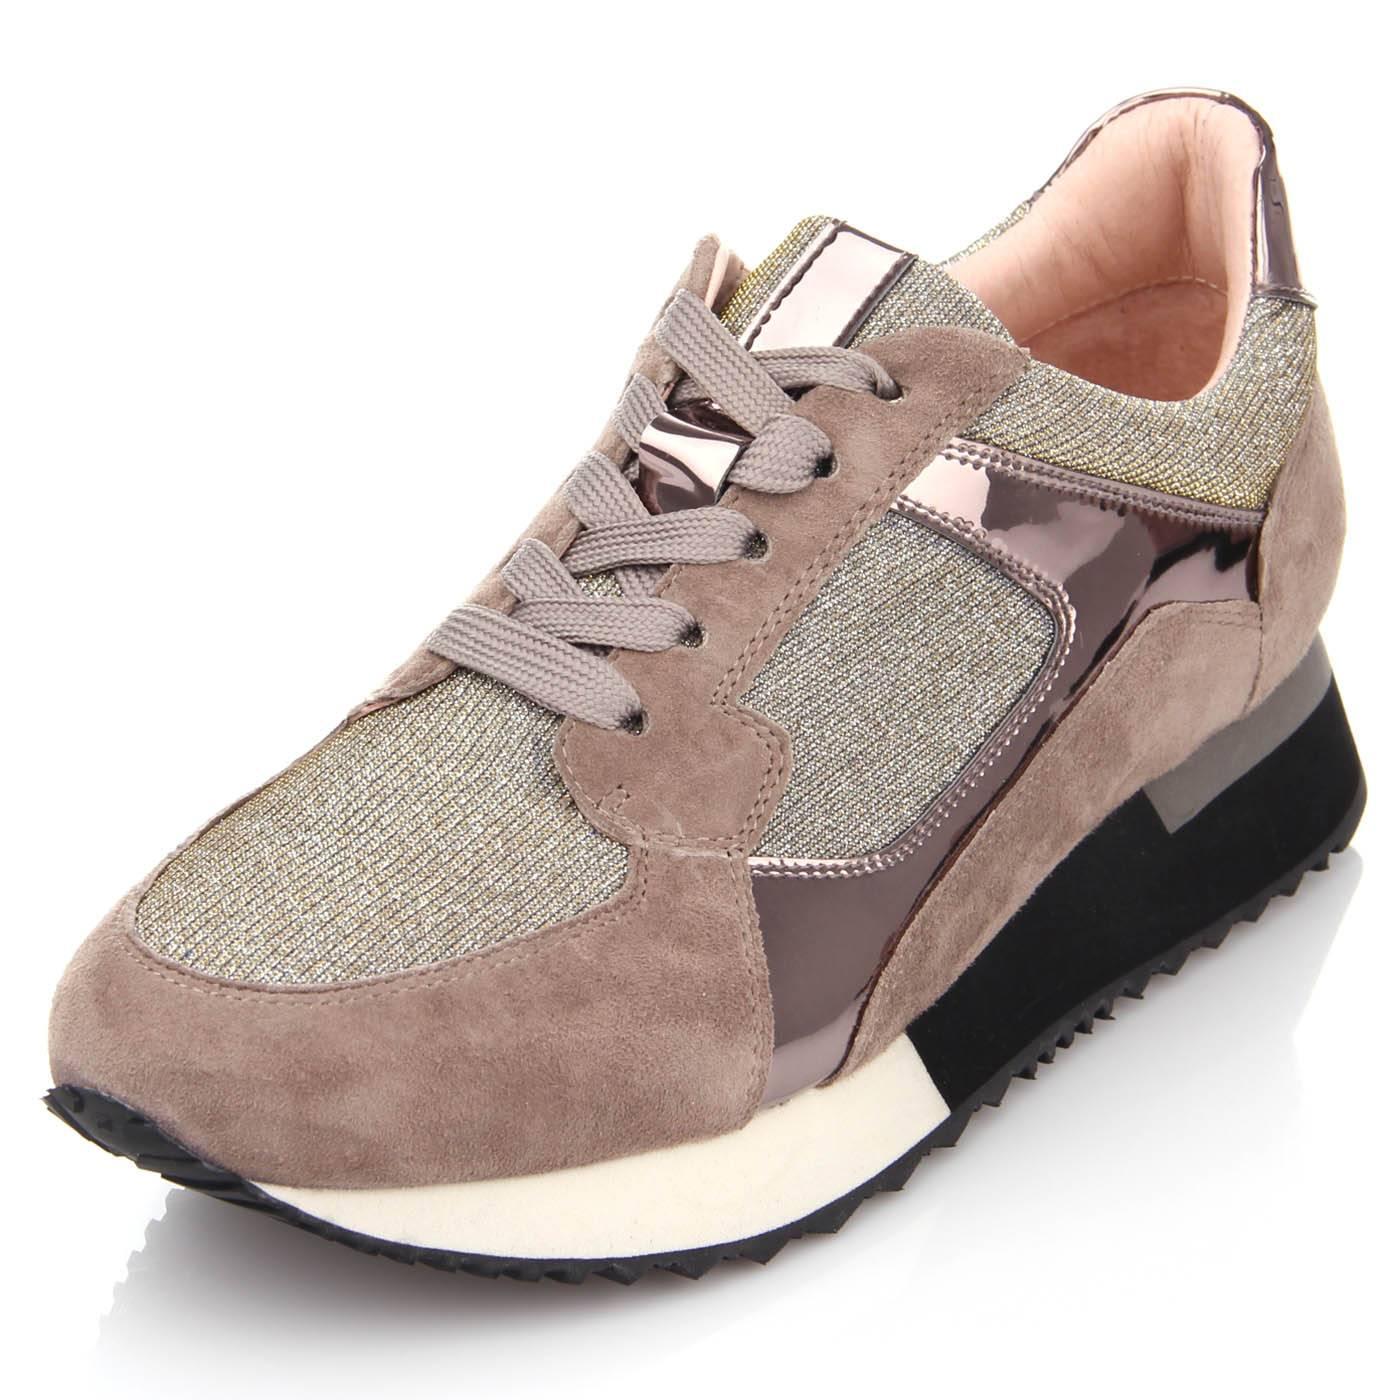 Кросівки жіночі ditto 6482 Бежевий купить по выгодной цене в ... 728b3928245de